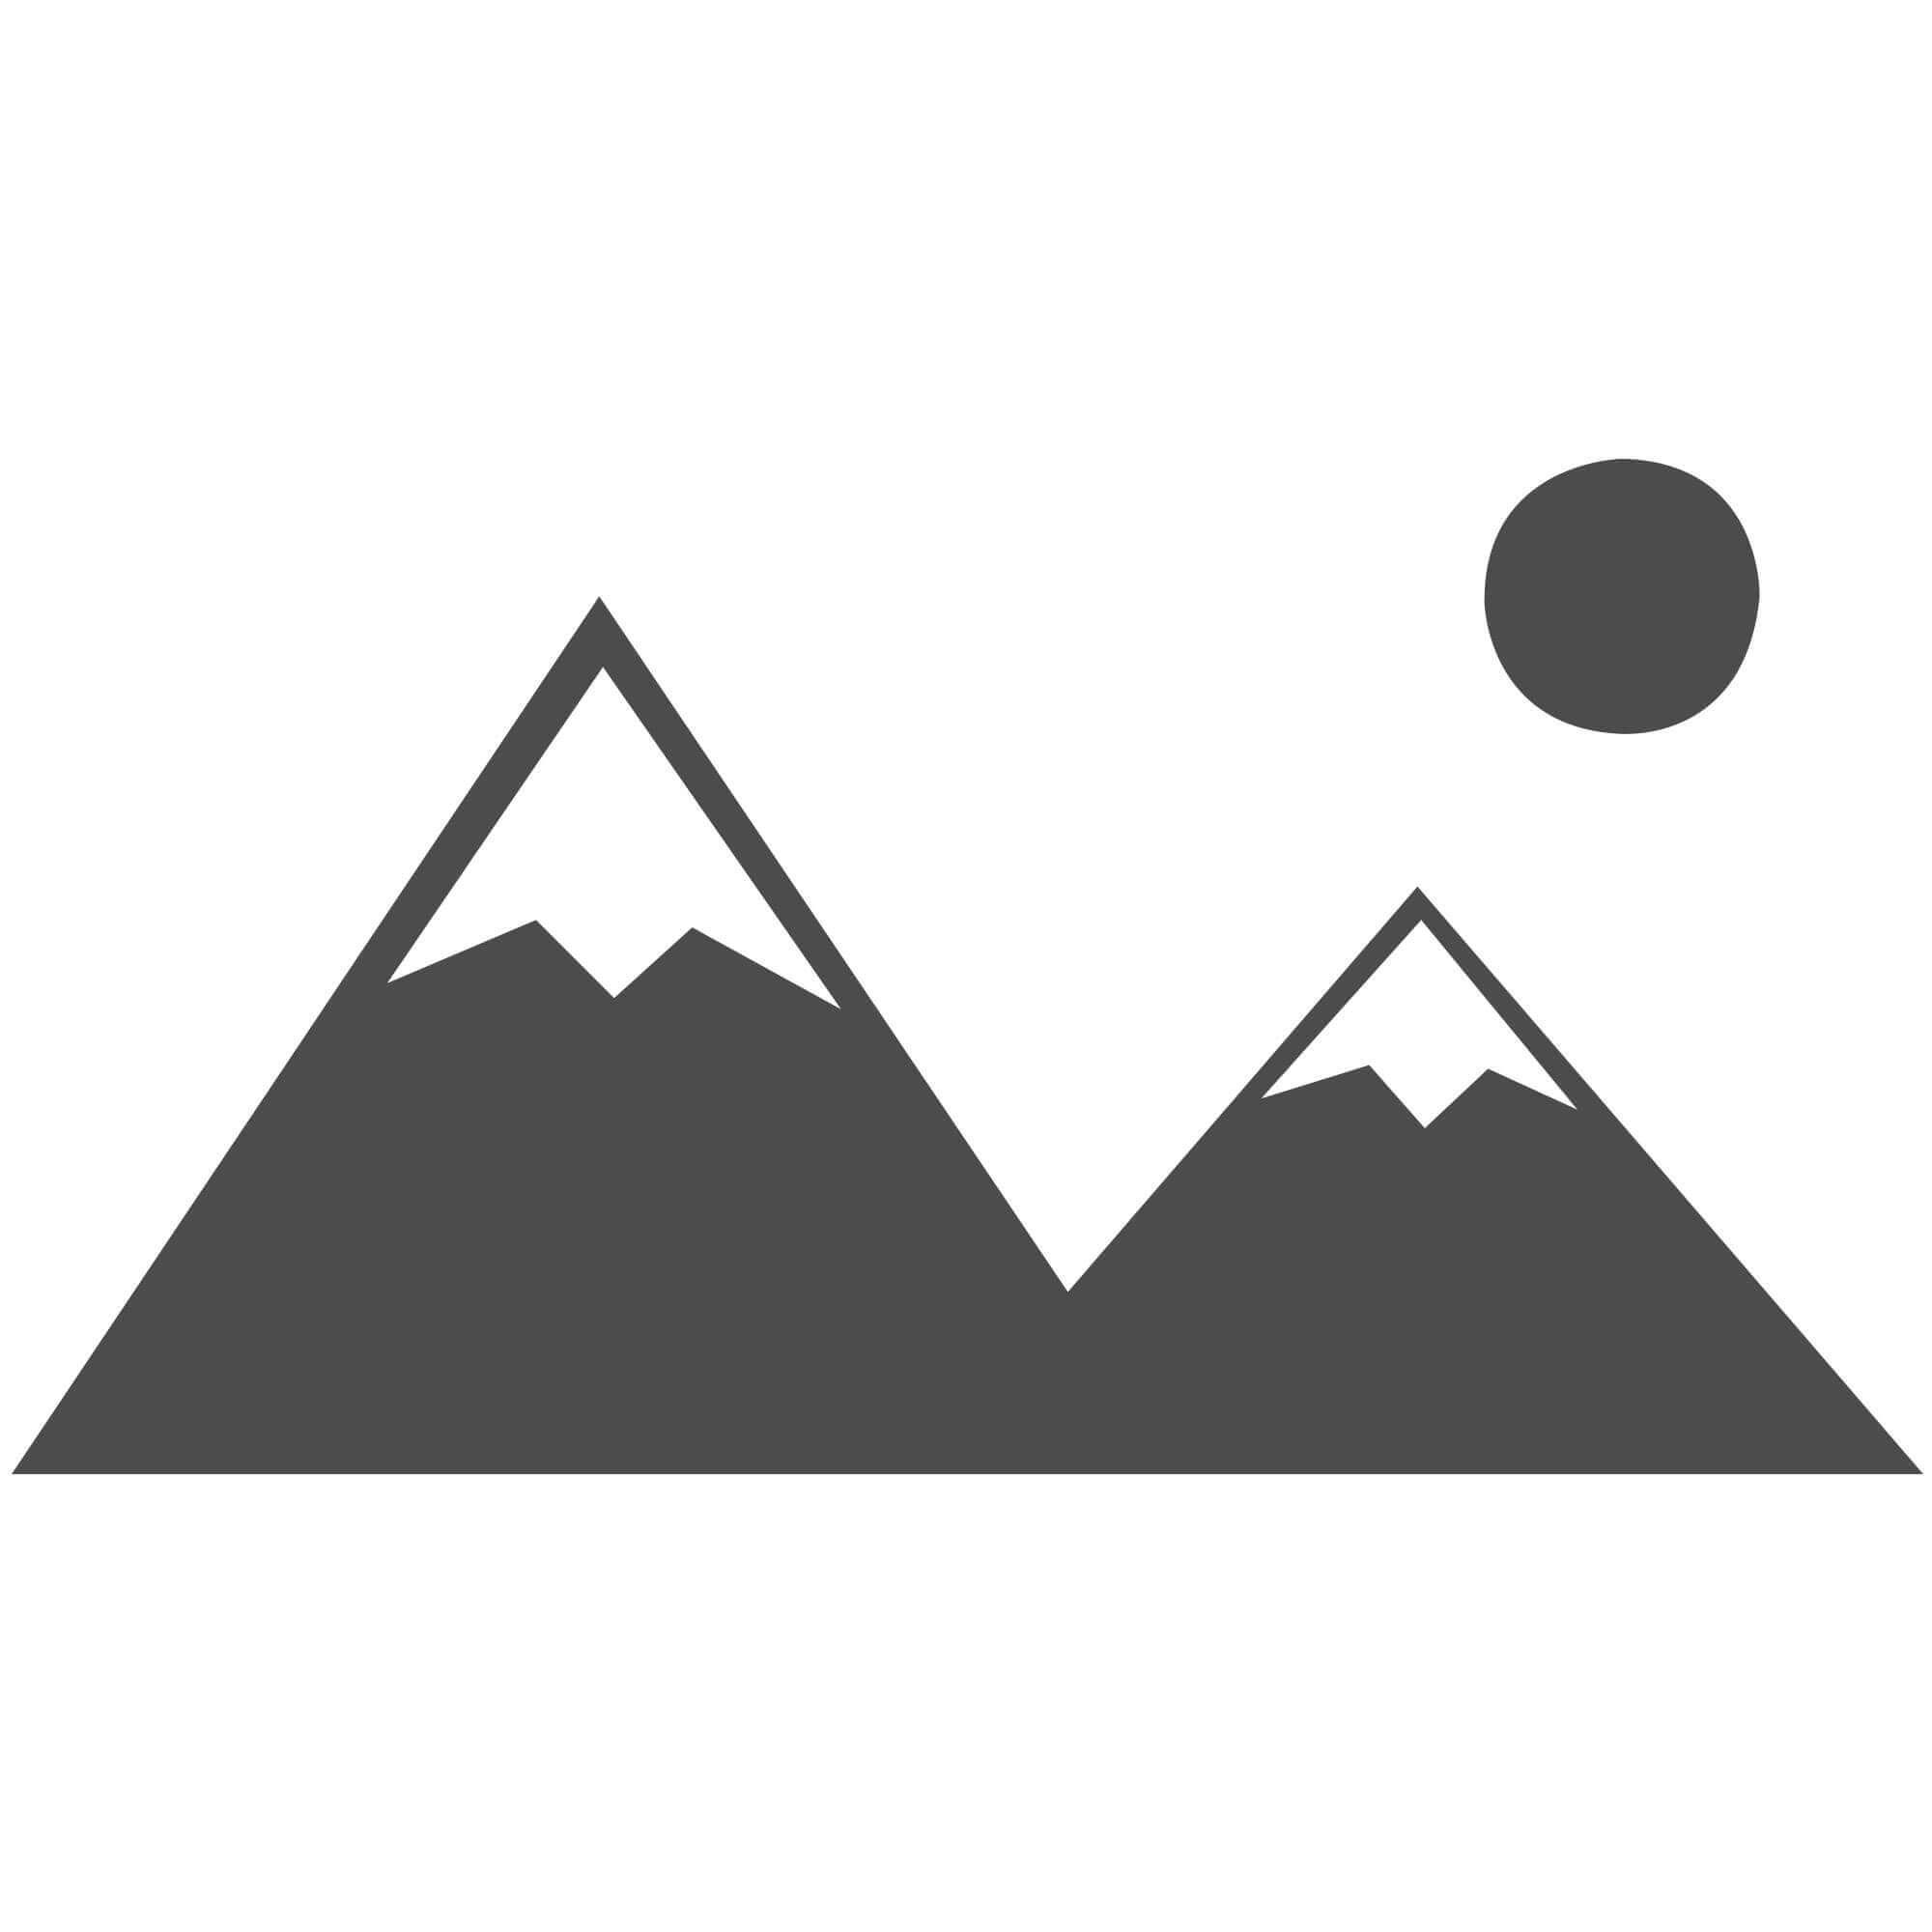 "Athena Shaggy Rug - Taupe - Size 140 x 200 cm (4'7"" x 6'7"")"